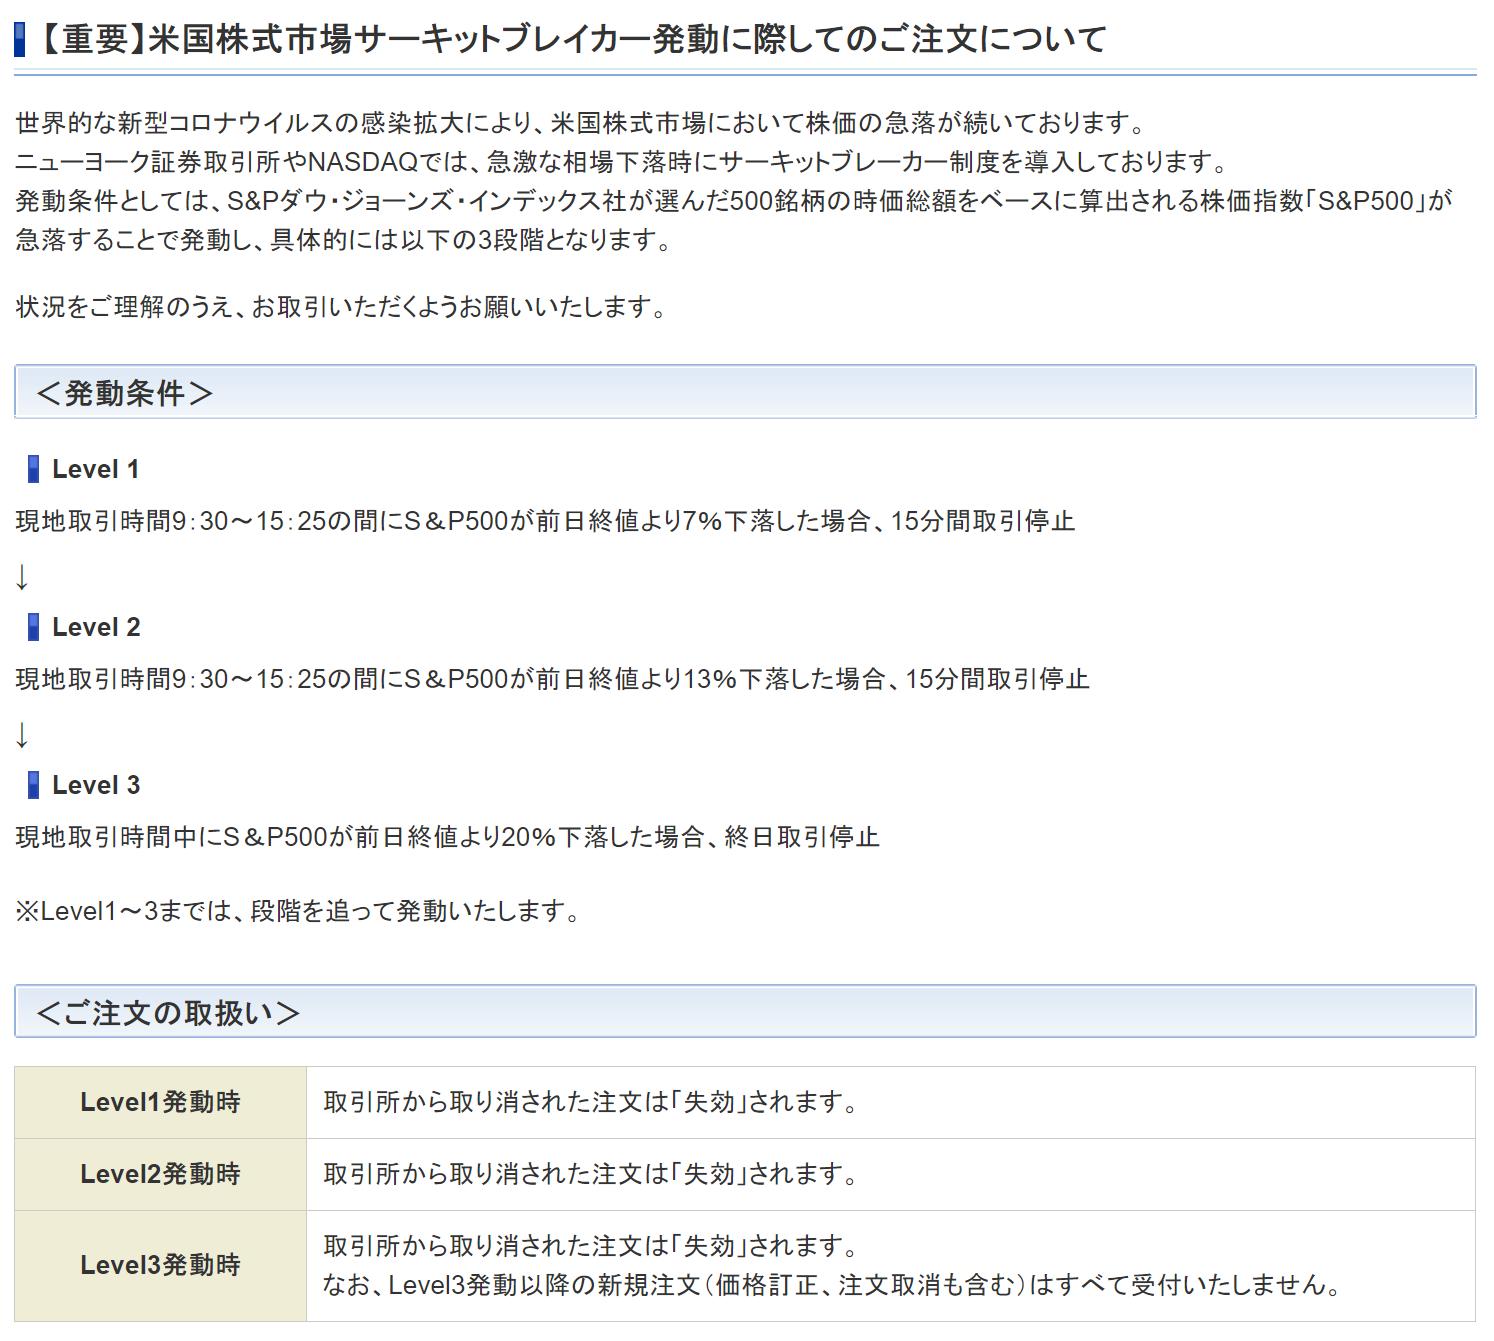 f:id:hodo-work:20200613143021p:plain